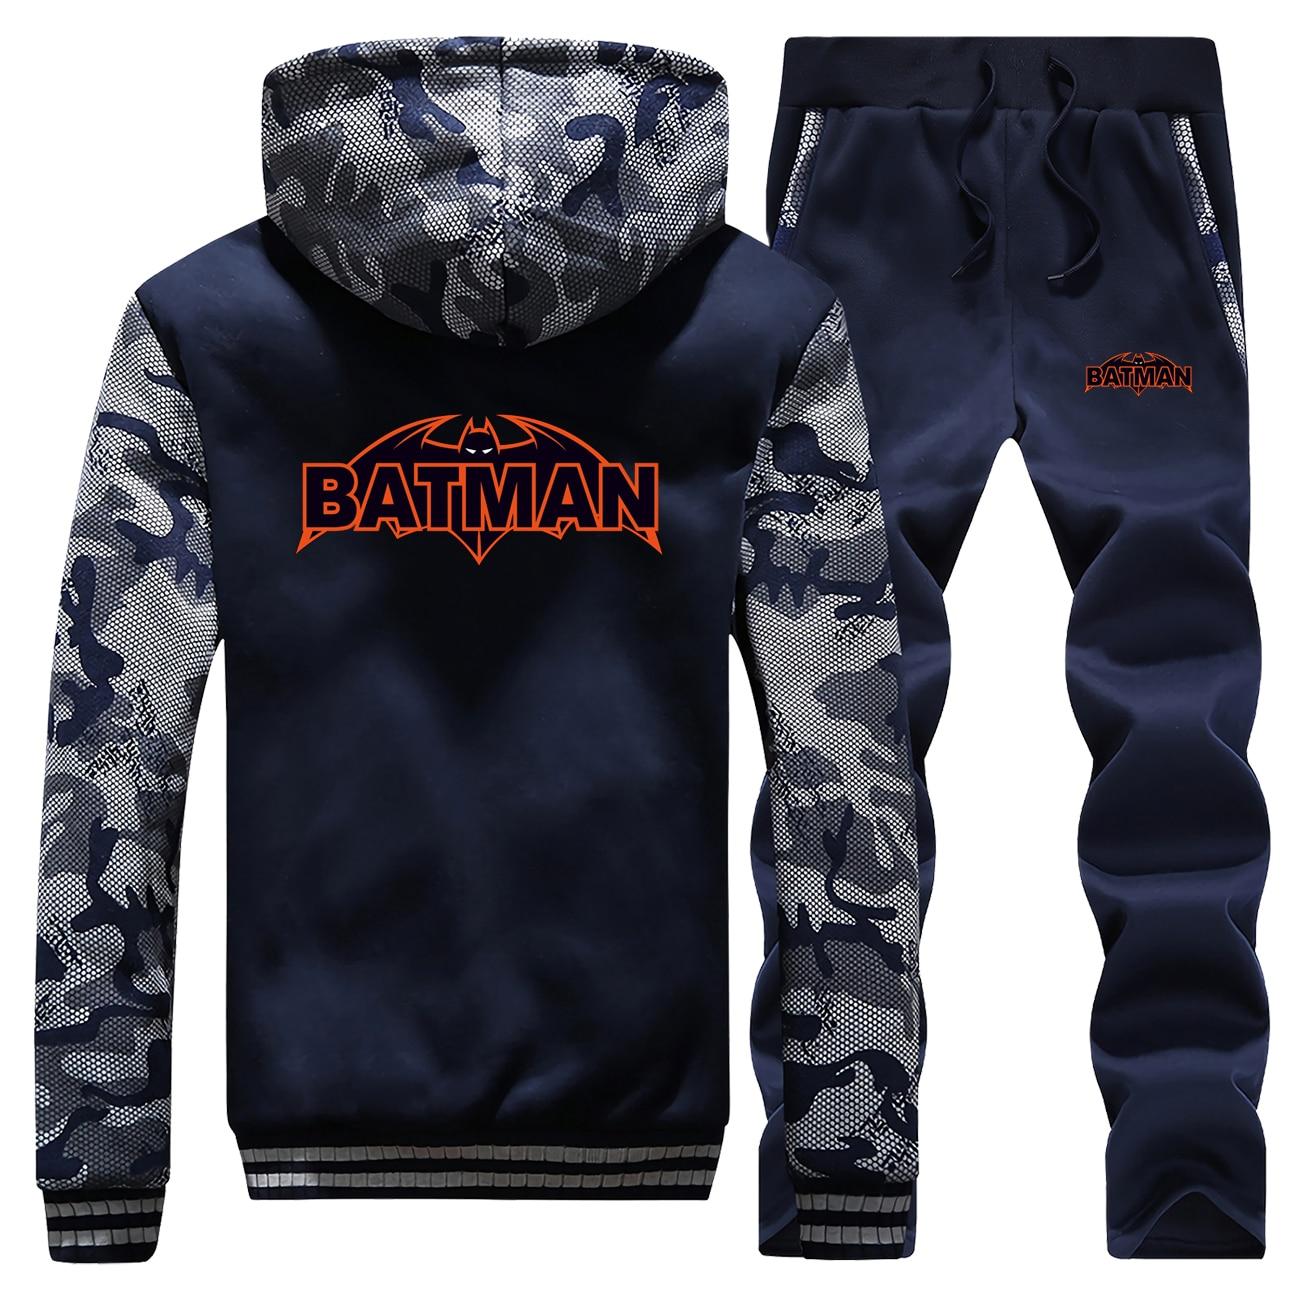 Batman Camo Sets Bruce Wayne Thick Jacket Fashion Dark Night Male Set Hip Hop Super Hero Zipper Pants Sweatshirts Warm Gym Suit